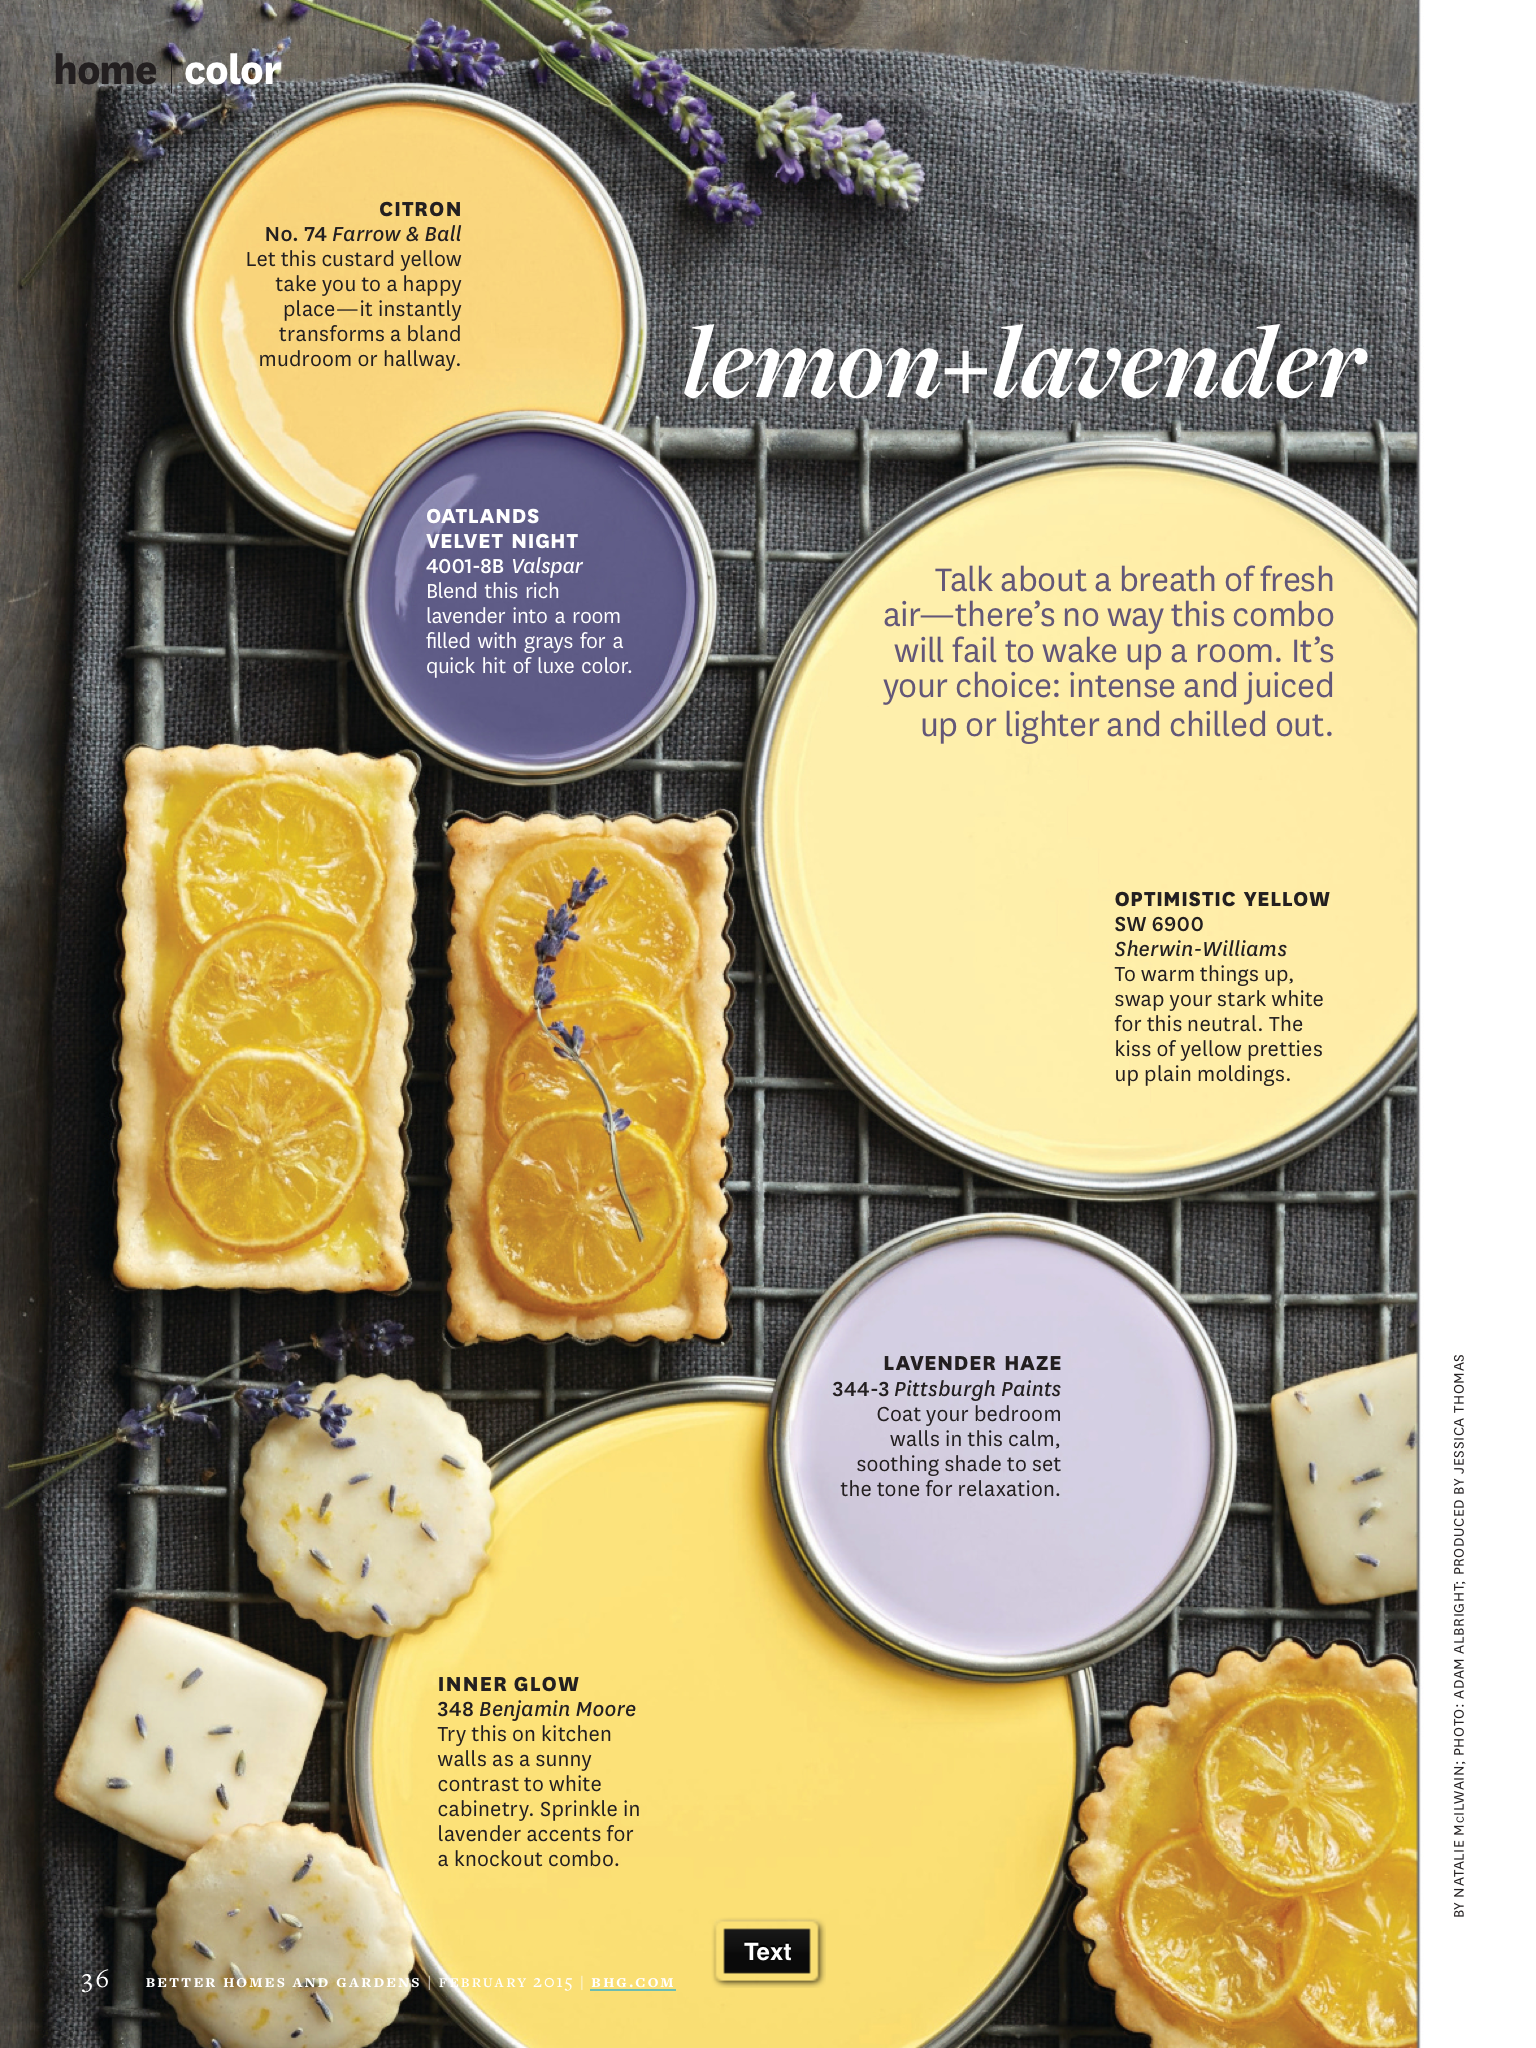 Better Homes and Gardens Lemon & Lavendar so glad I found this!! I ...